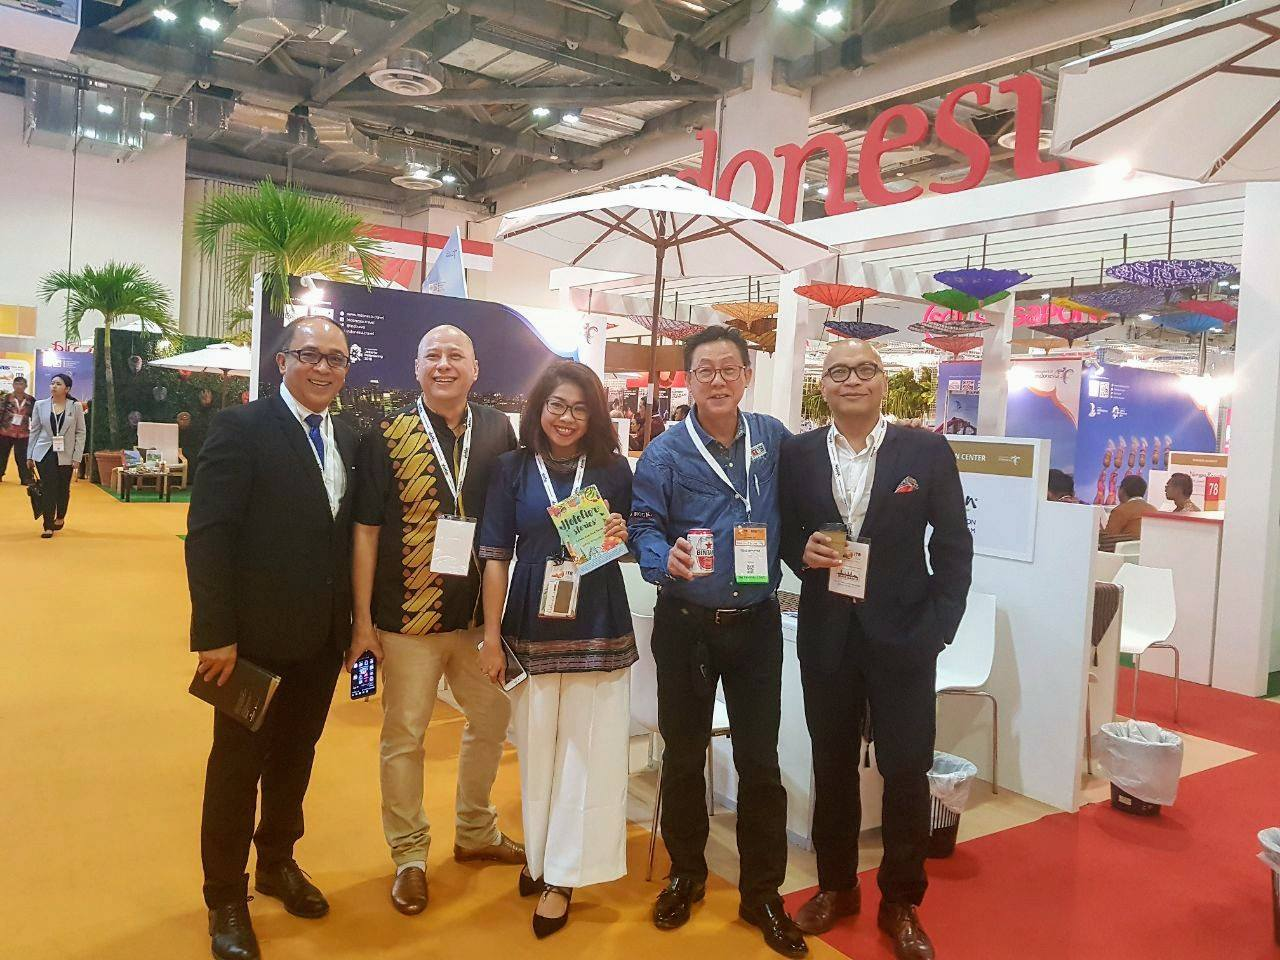 Jeffrey Wibisono V. @namakubrandku Hospitality Industry Consultant Indonesia in Bali, Telu Learning Consulting, Copywriter, Jasa Konsultan Hotel